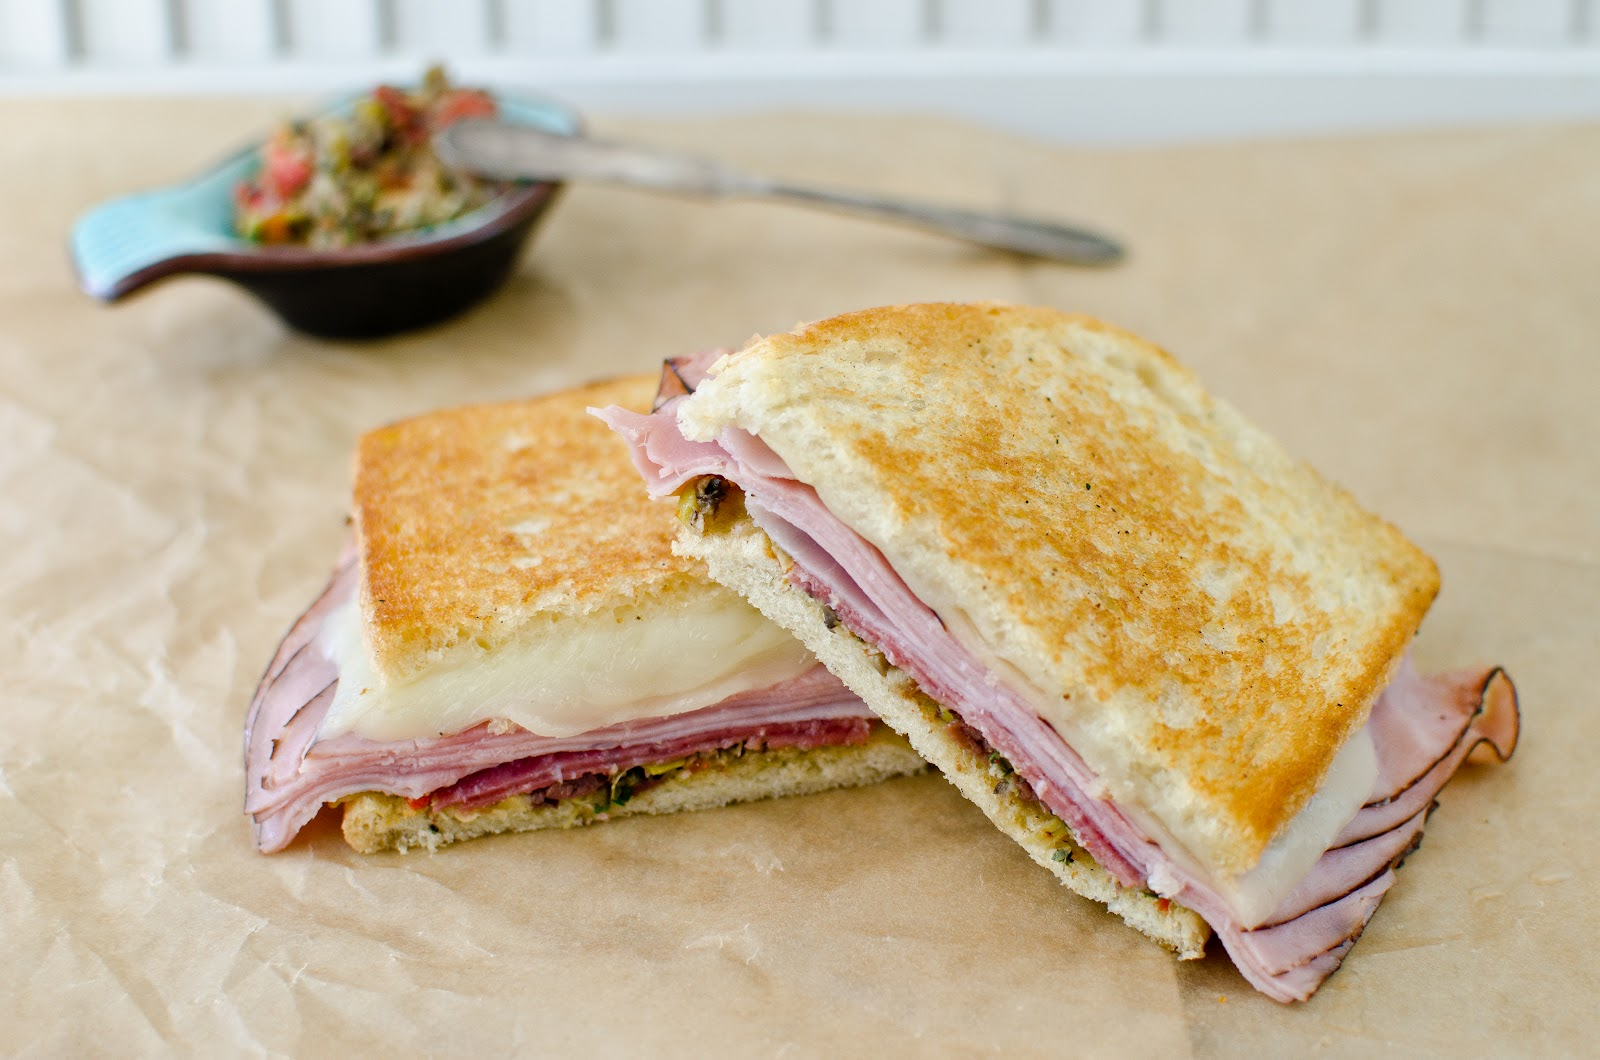 The Church Cook: Mock Muffaletta Sandwich & Olive Salad